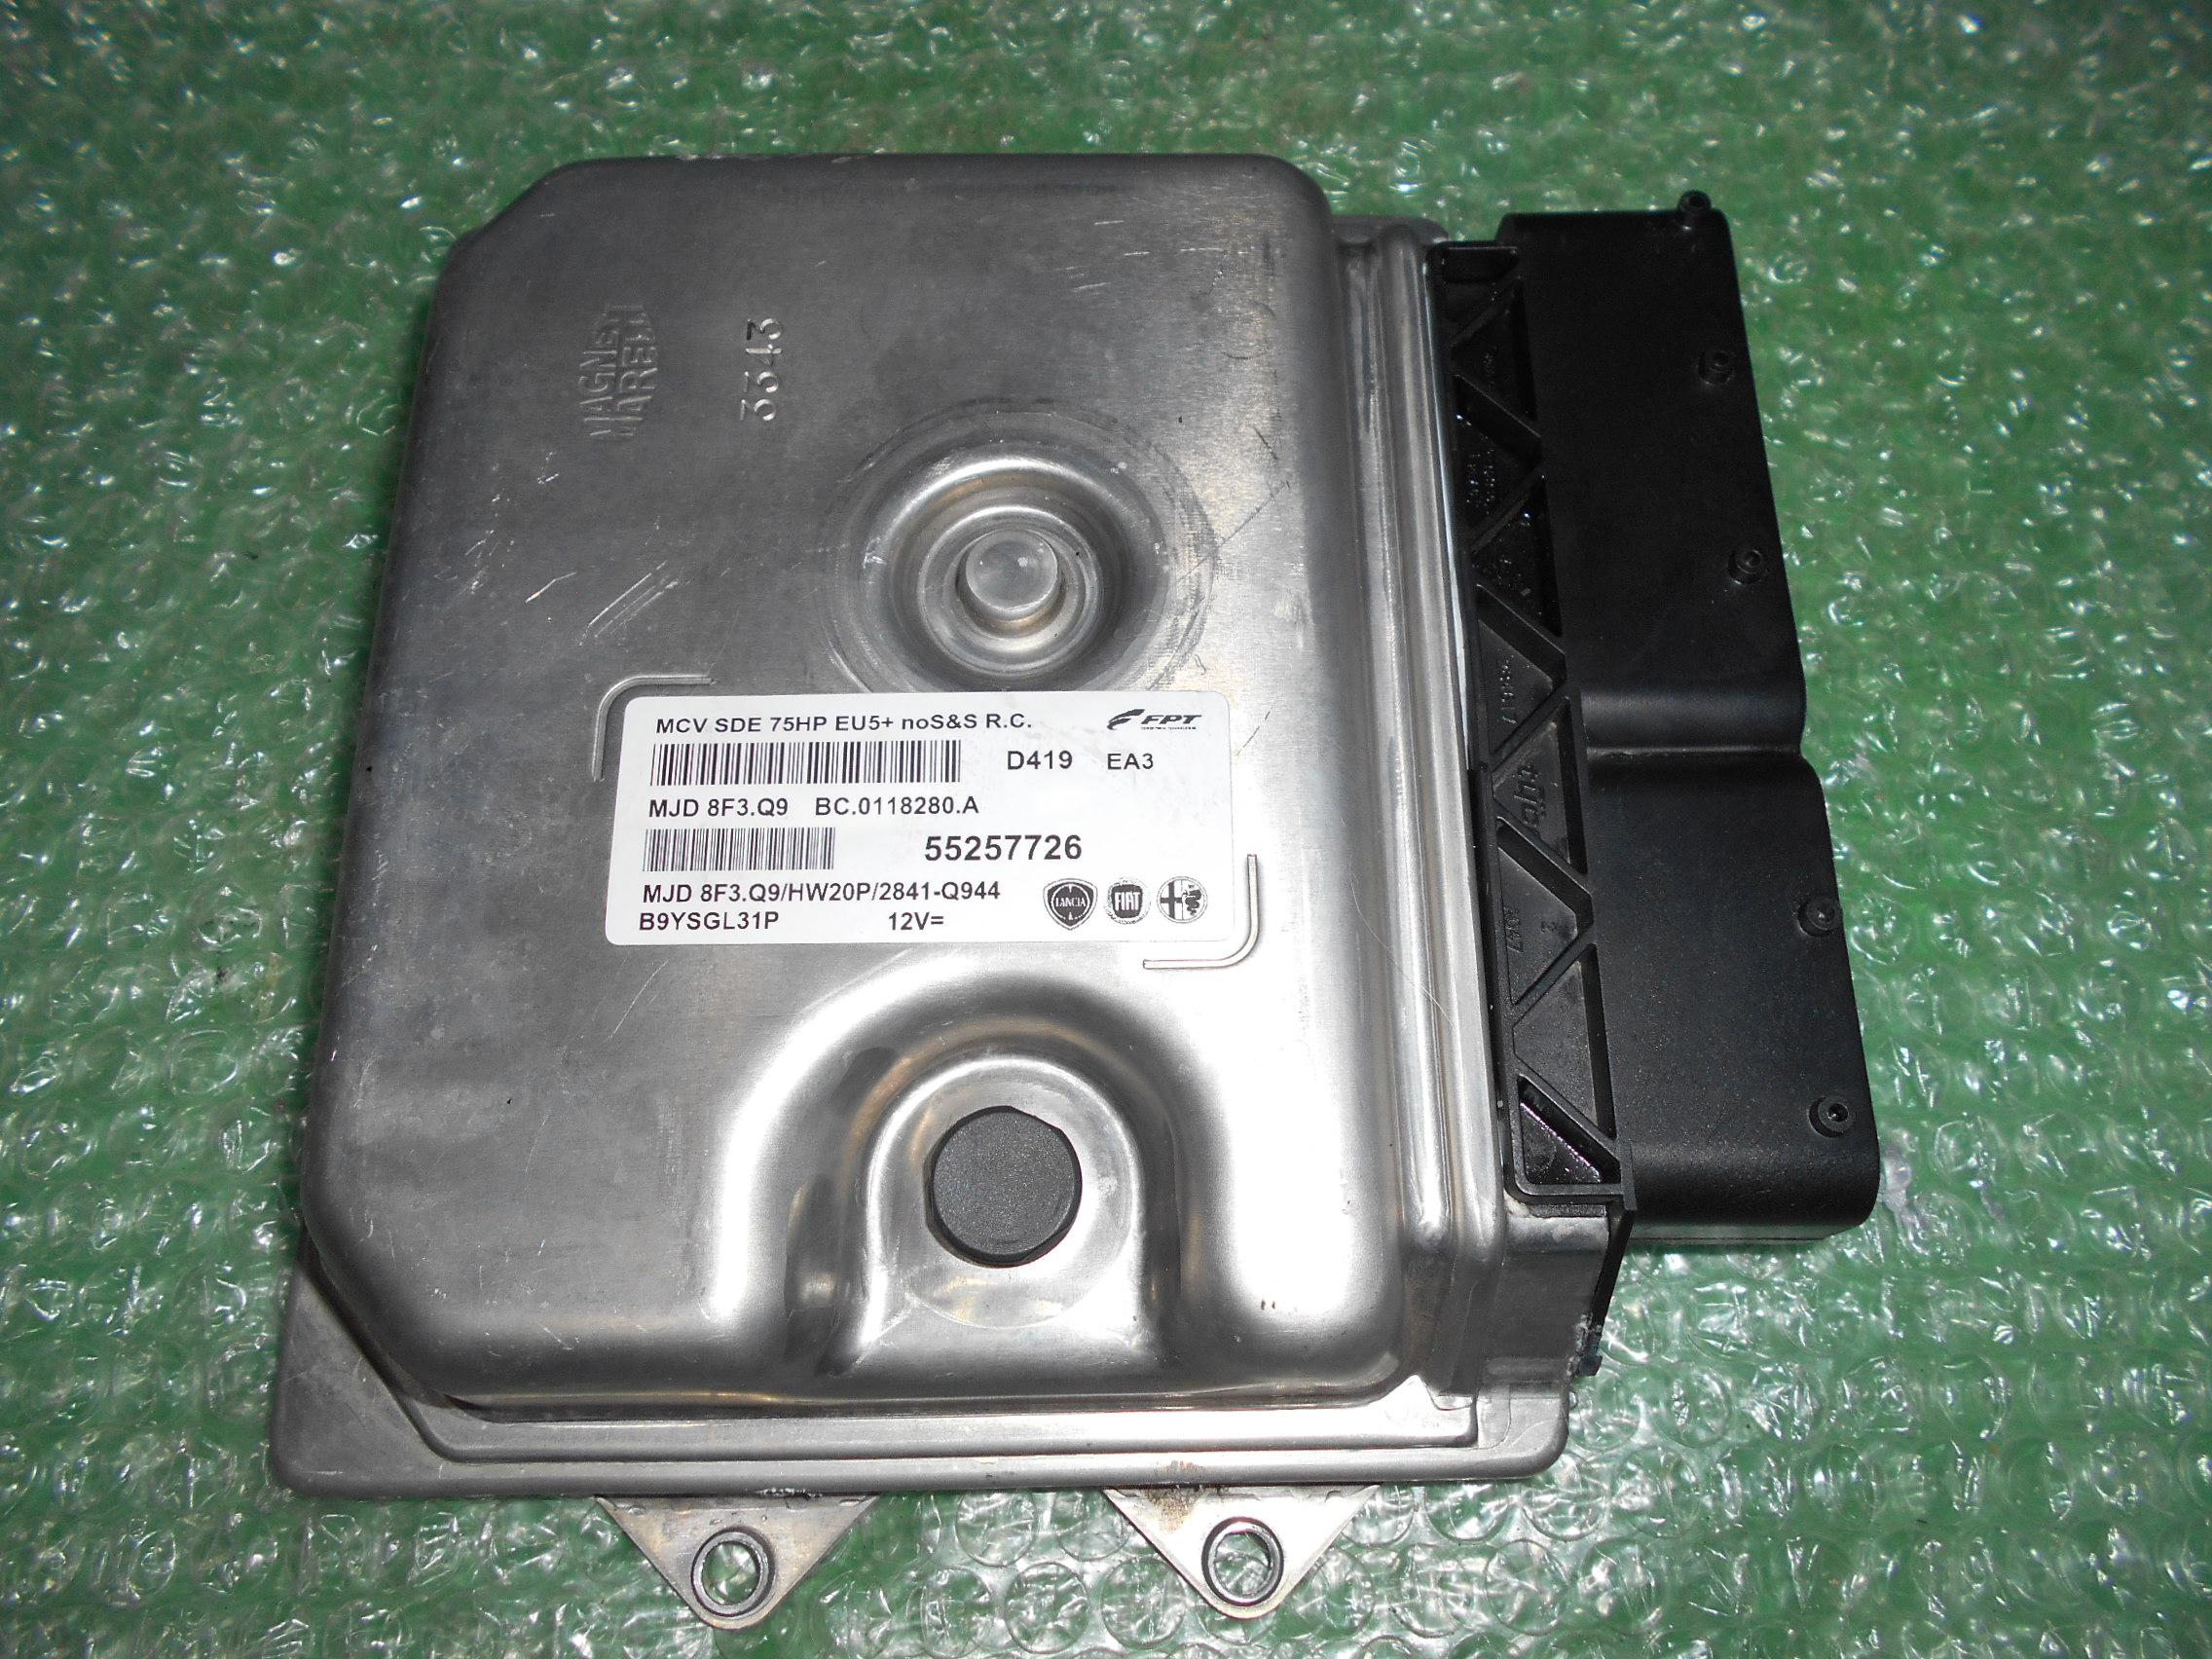 CENTRALITA UCE MOTOR 55257726 (MJD 8F3.Q9) – FIAT FIORINO – FIAT DOBLÓ II – PEUGEOT BIPPER – CITROEN NEMO 1.3 JTDM 16V (75HP)(2008-2018)